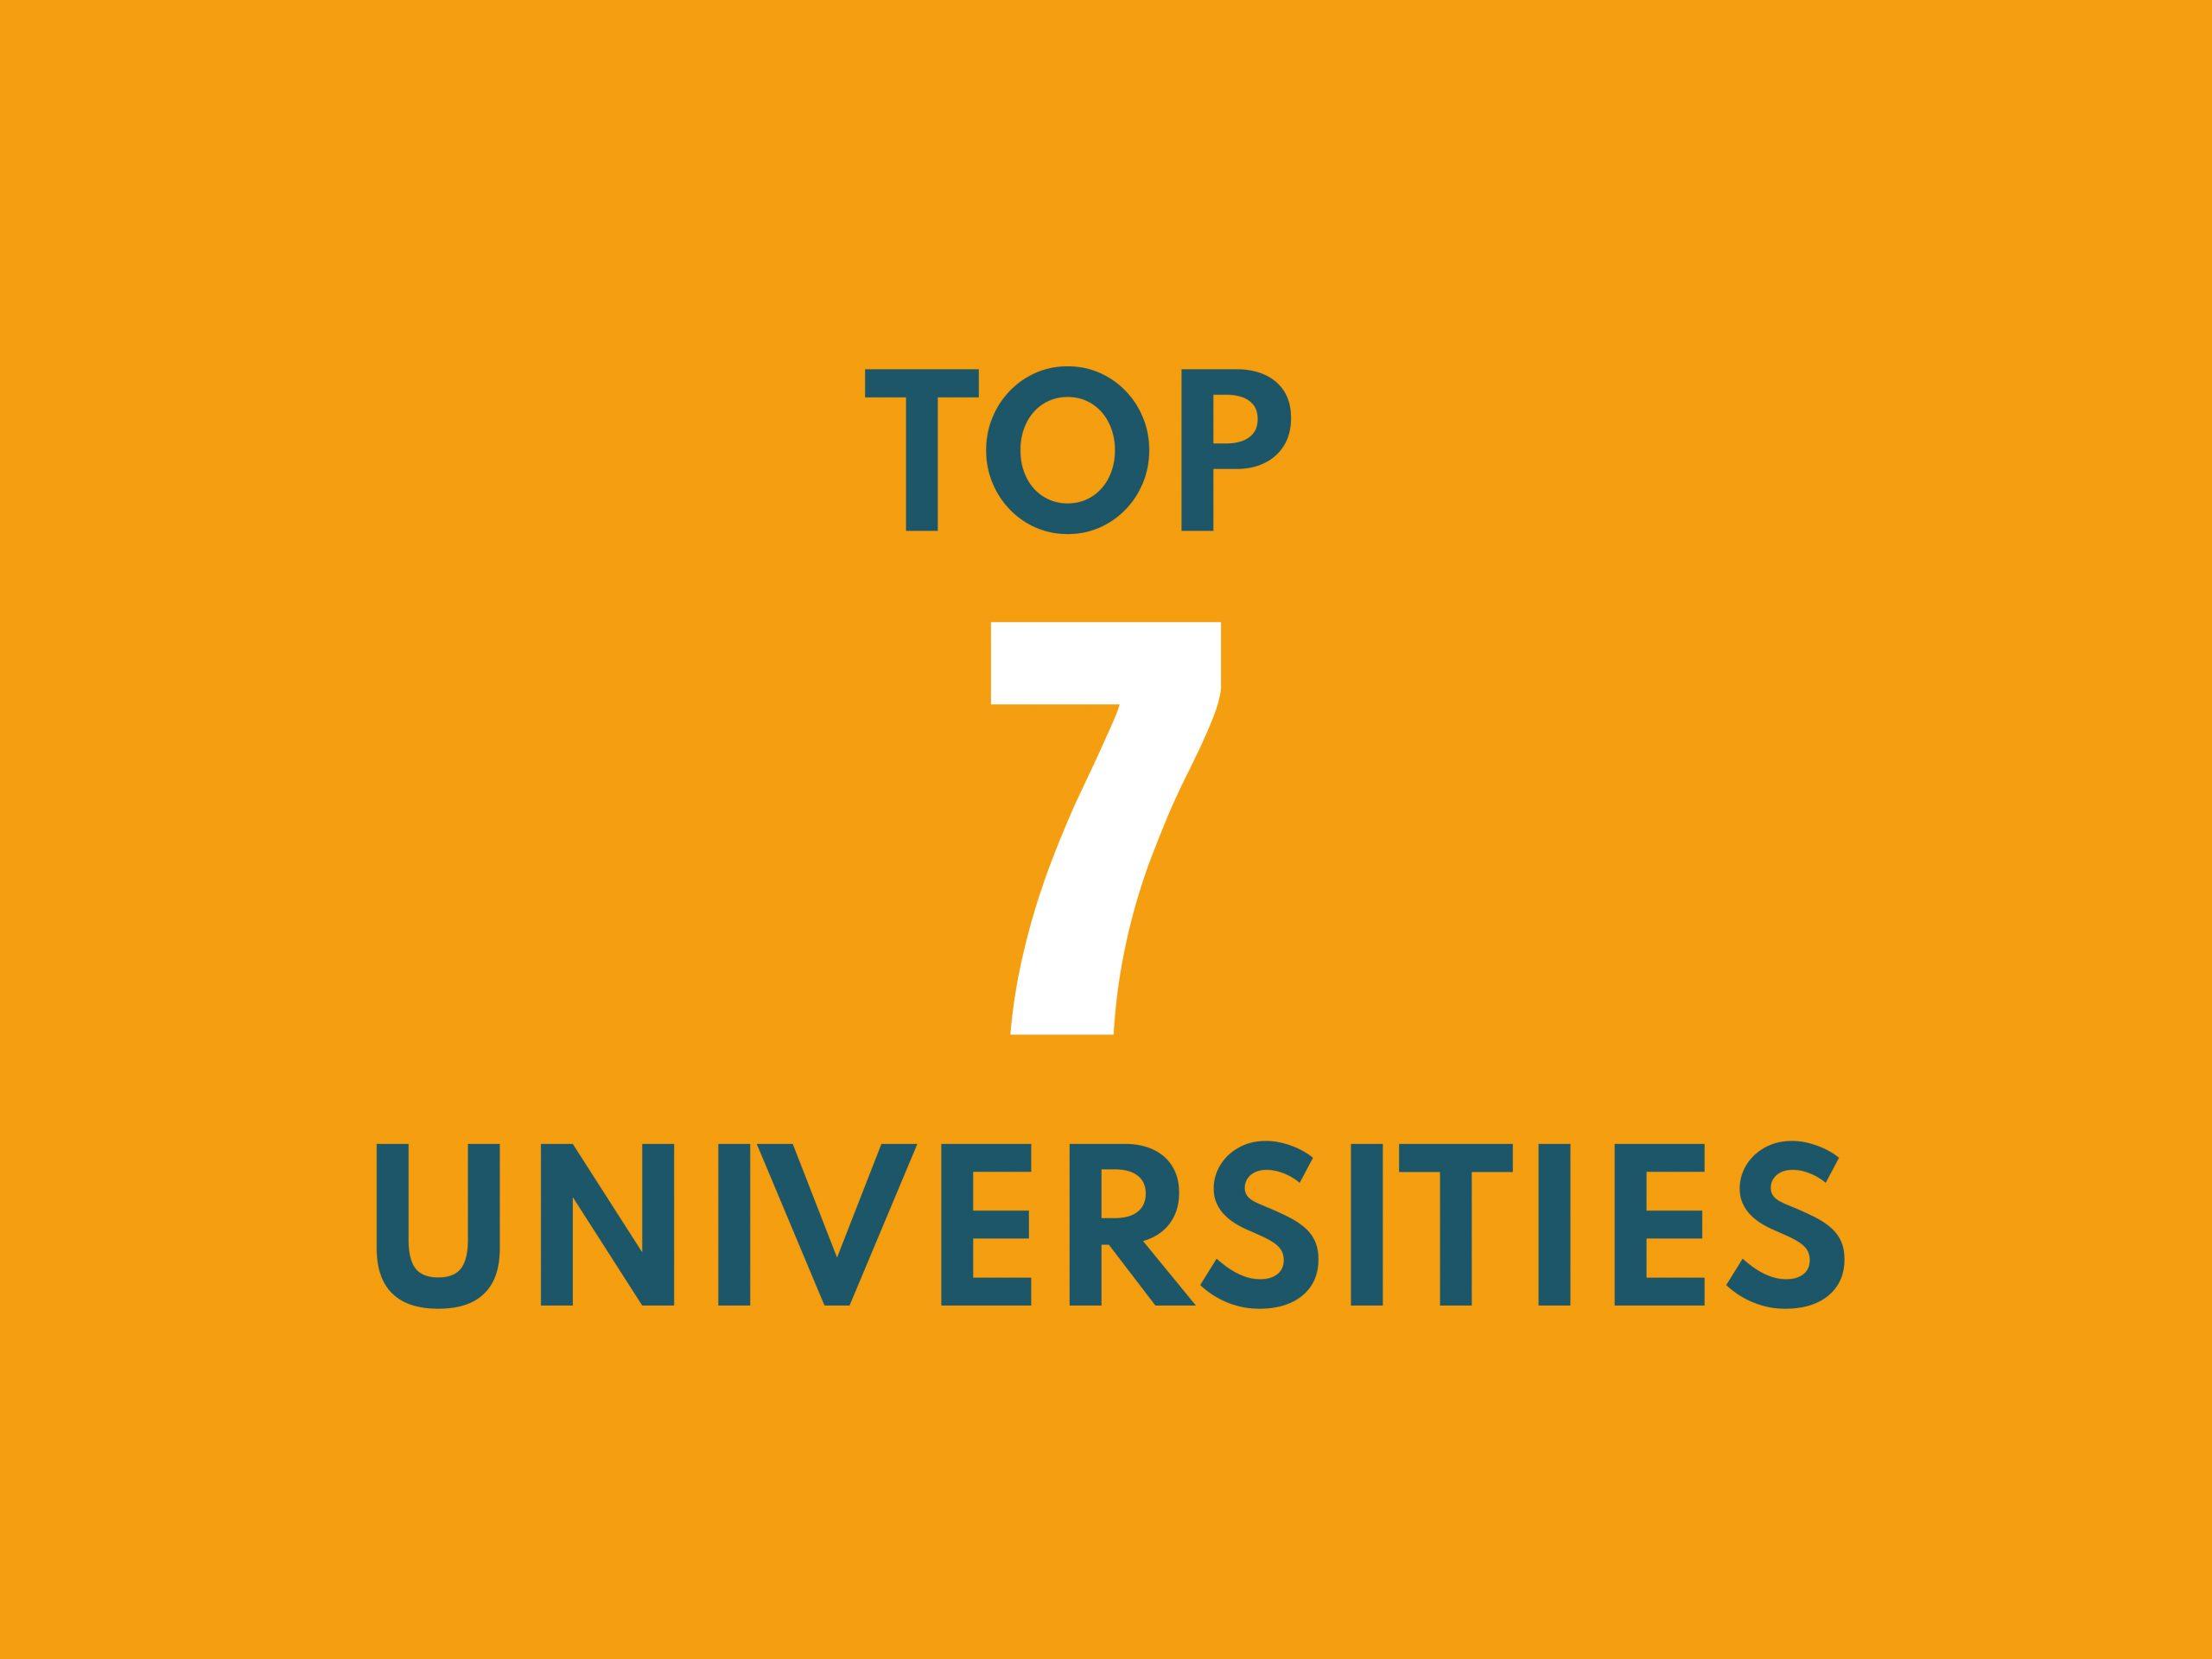 top 7 universities of digital marketing